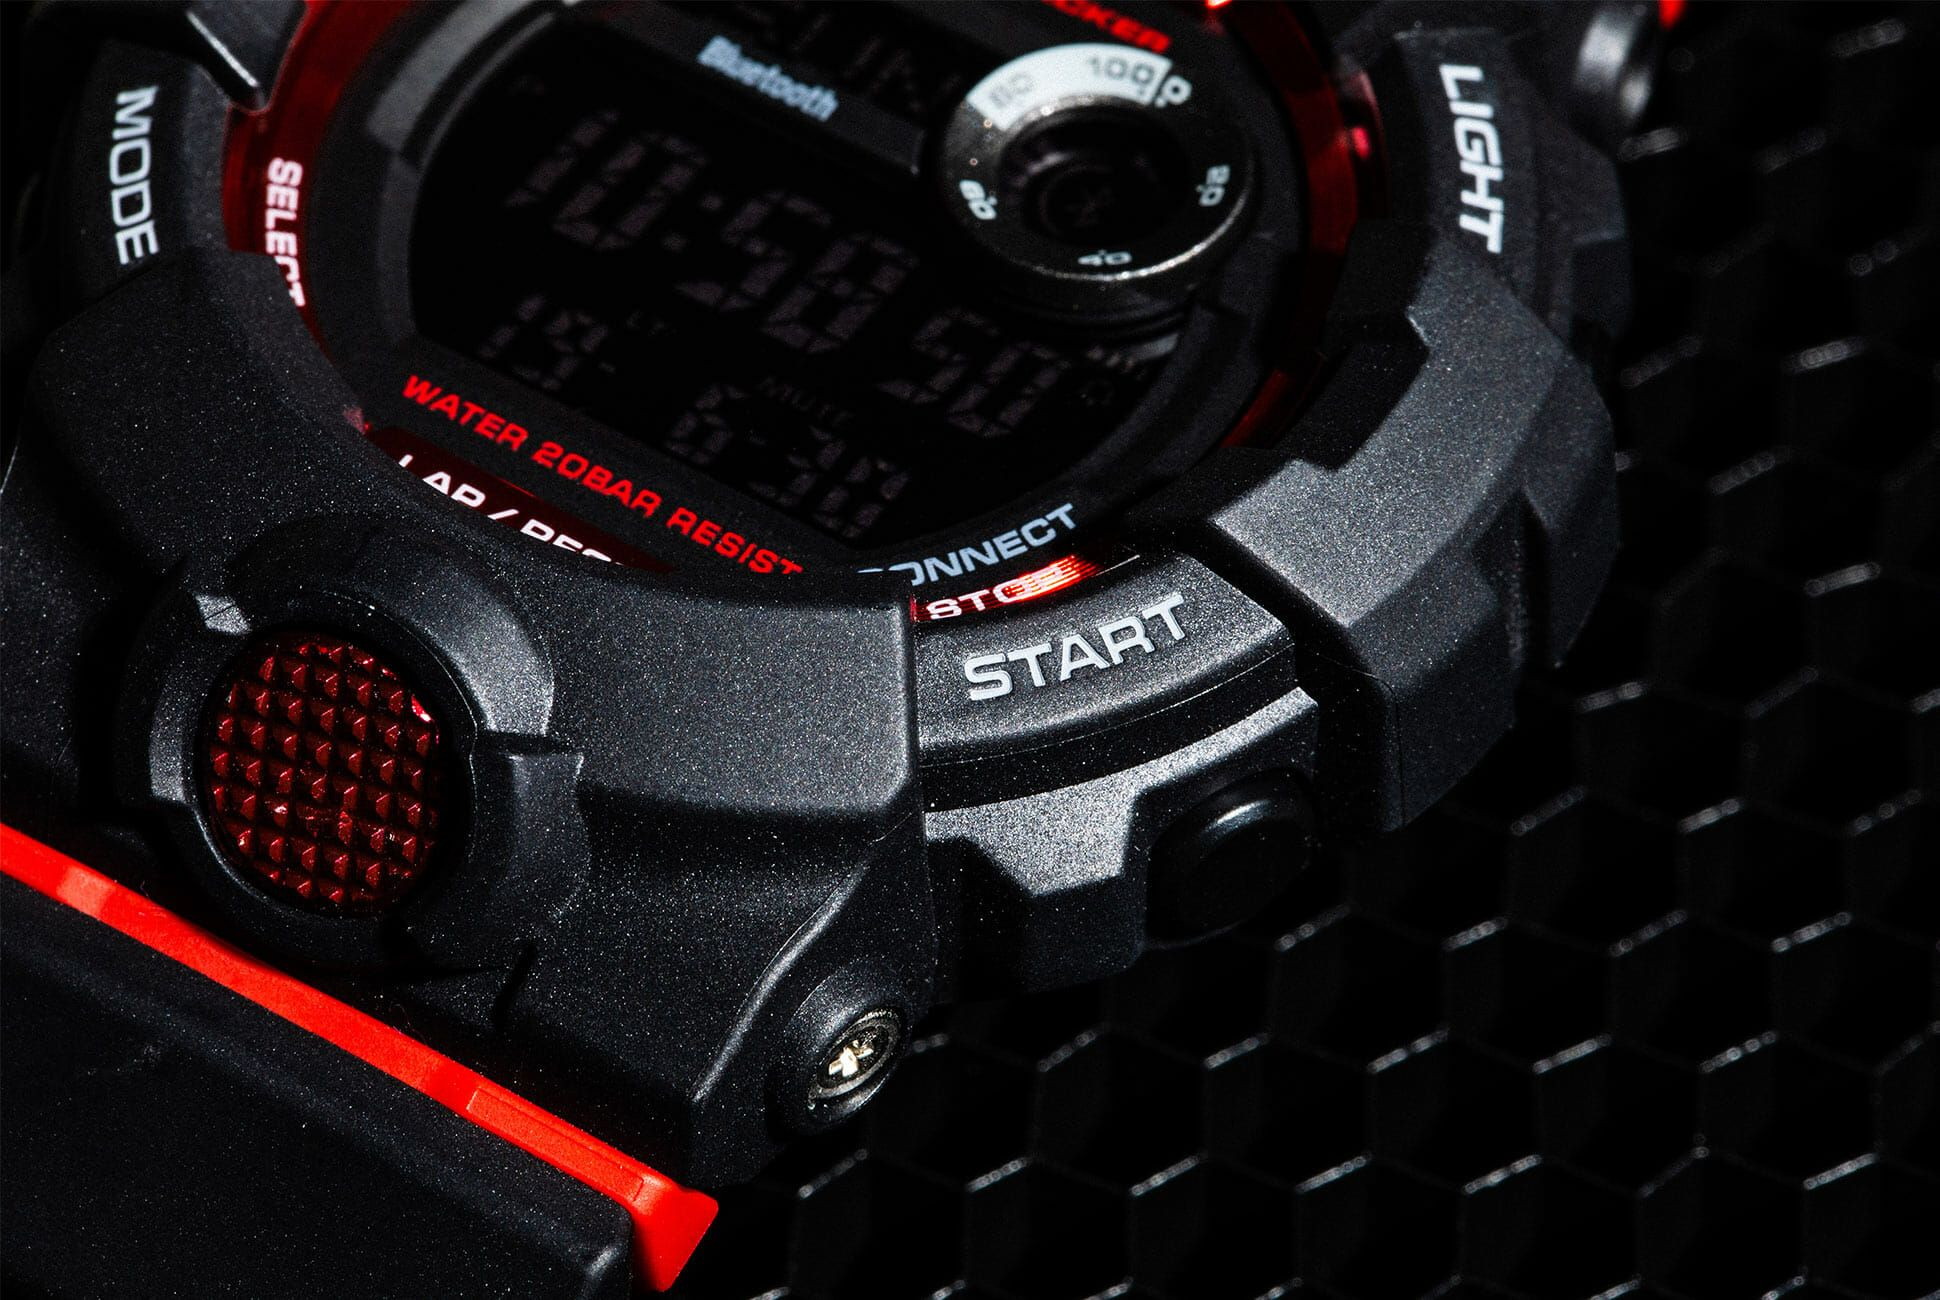 Sponsored-Casio-G-Shock-GBD800-gear-patrol-slide-2